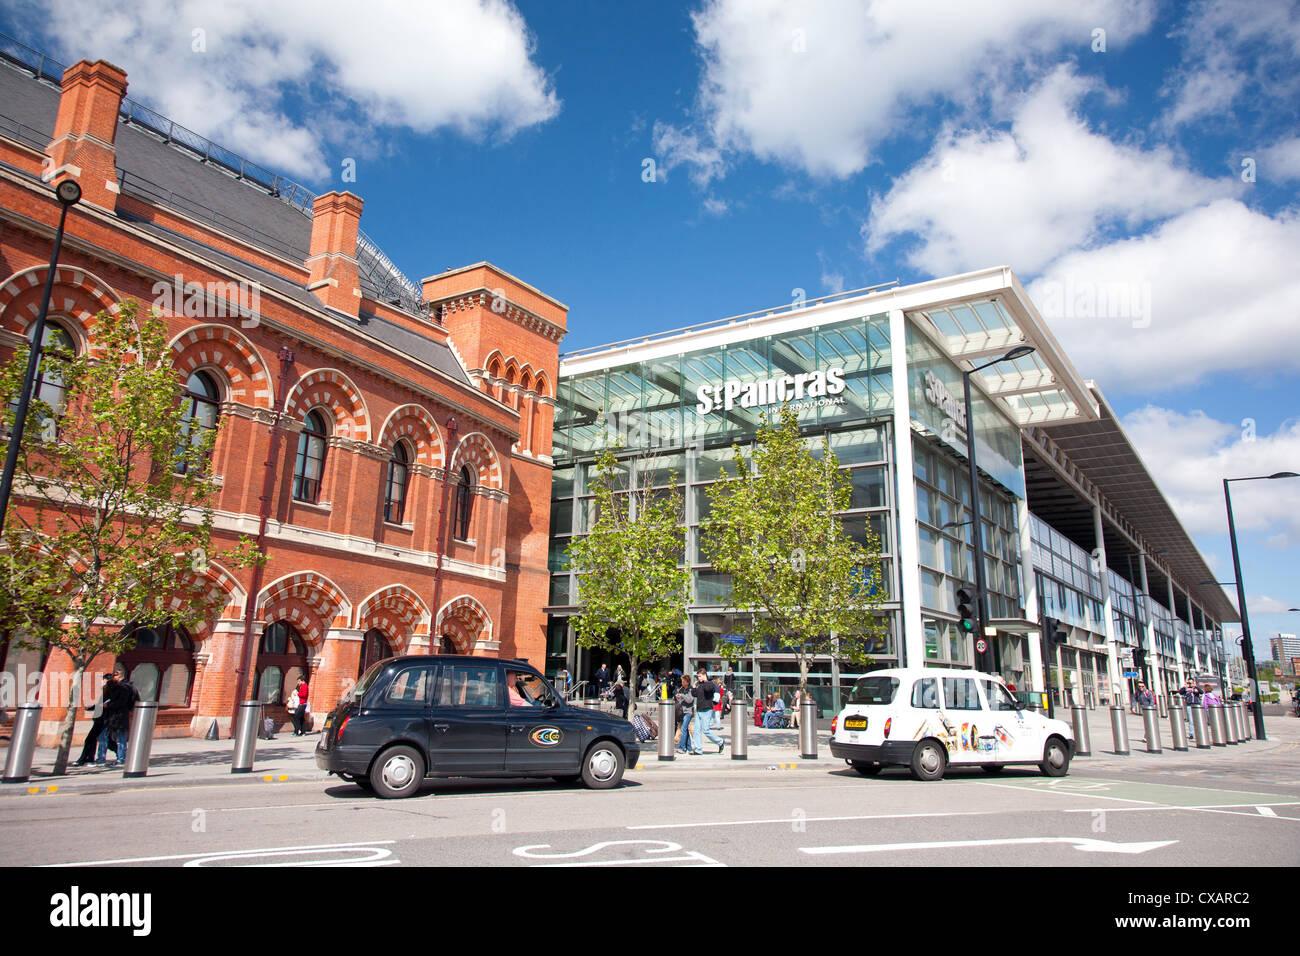 St. Pancras International Station entrance on Pancras Road, London, England, United Kingdom, Europe - Stock Image